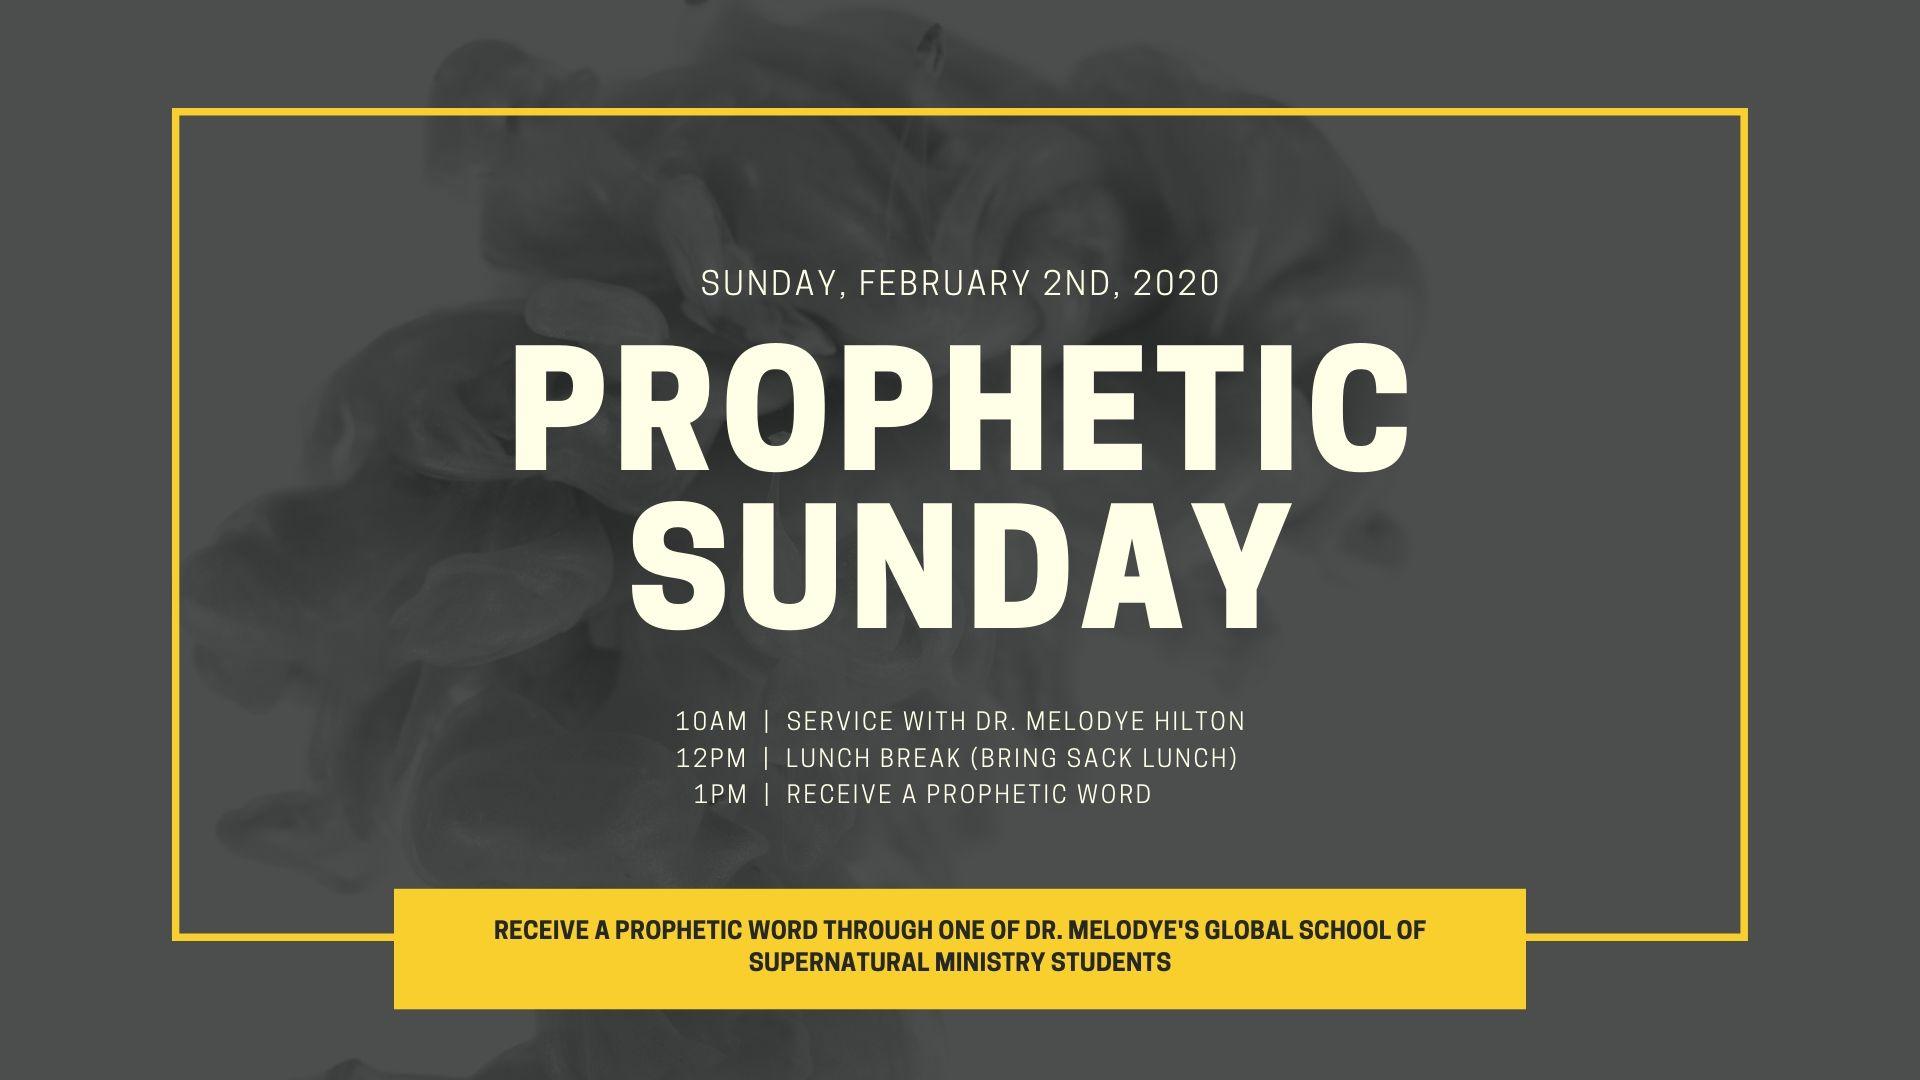 Prophetic Sunday